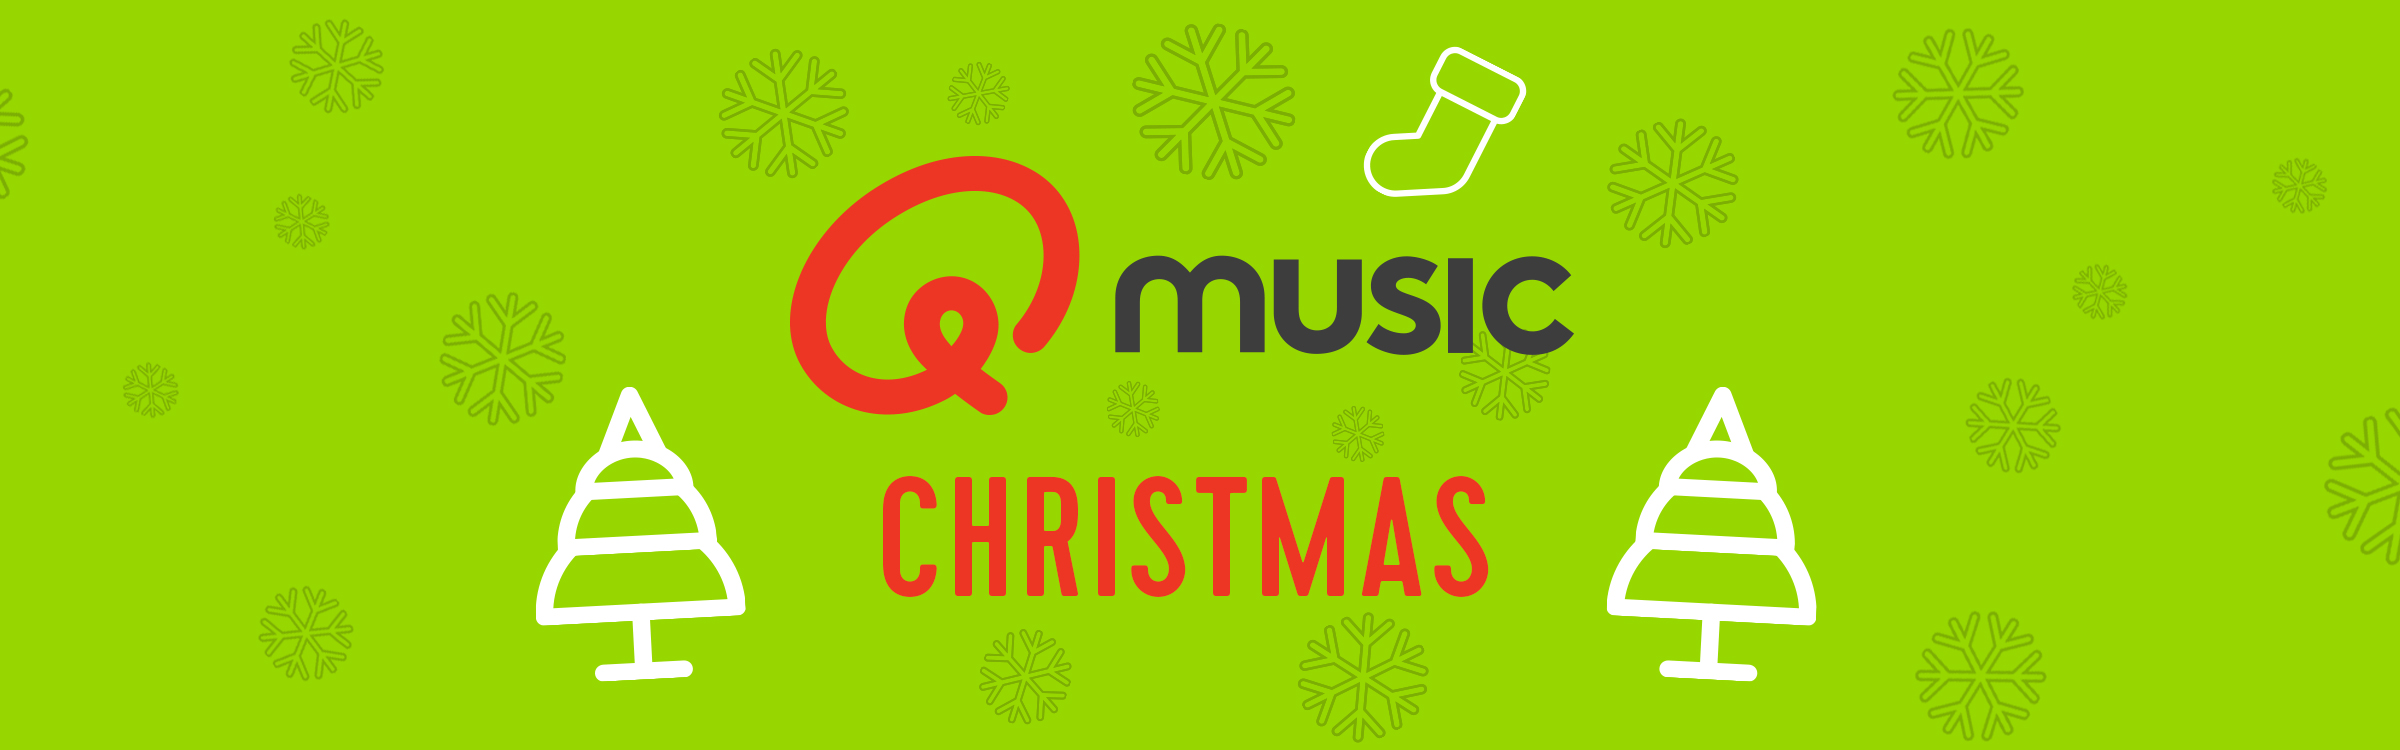 Qmusic actionheader kerst